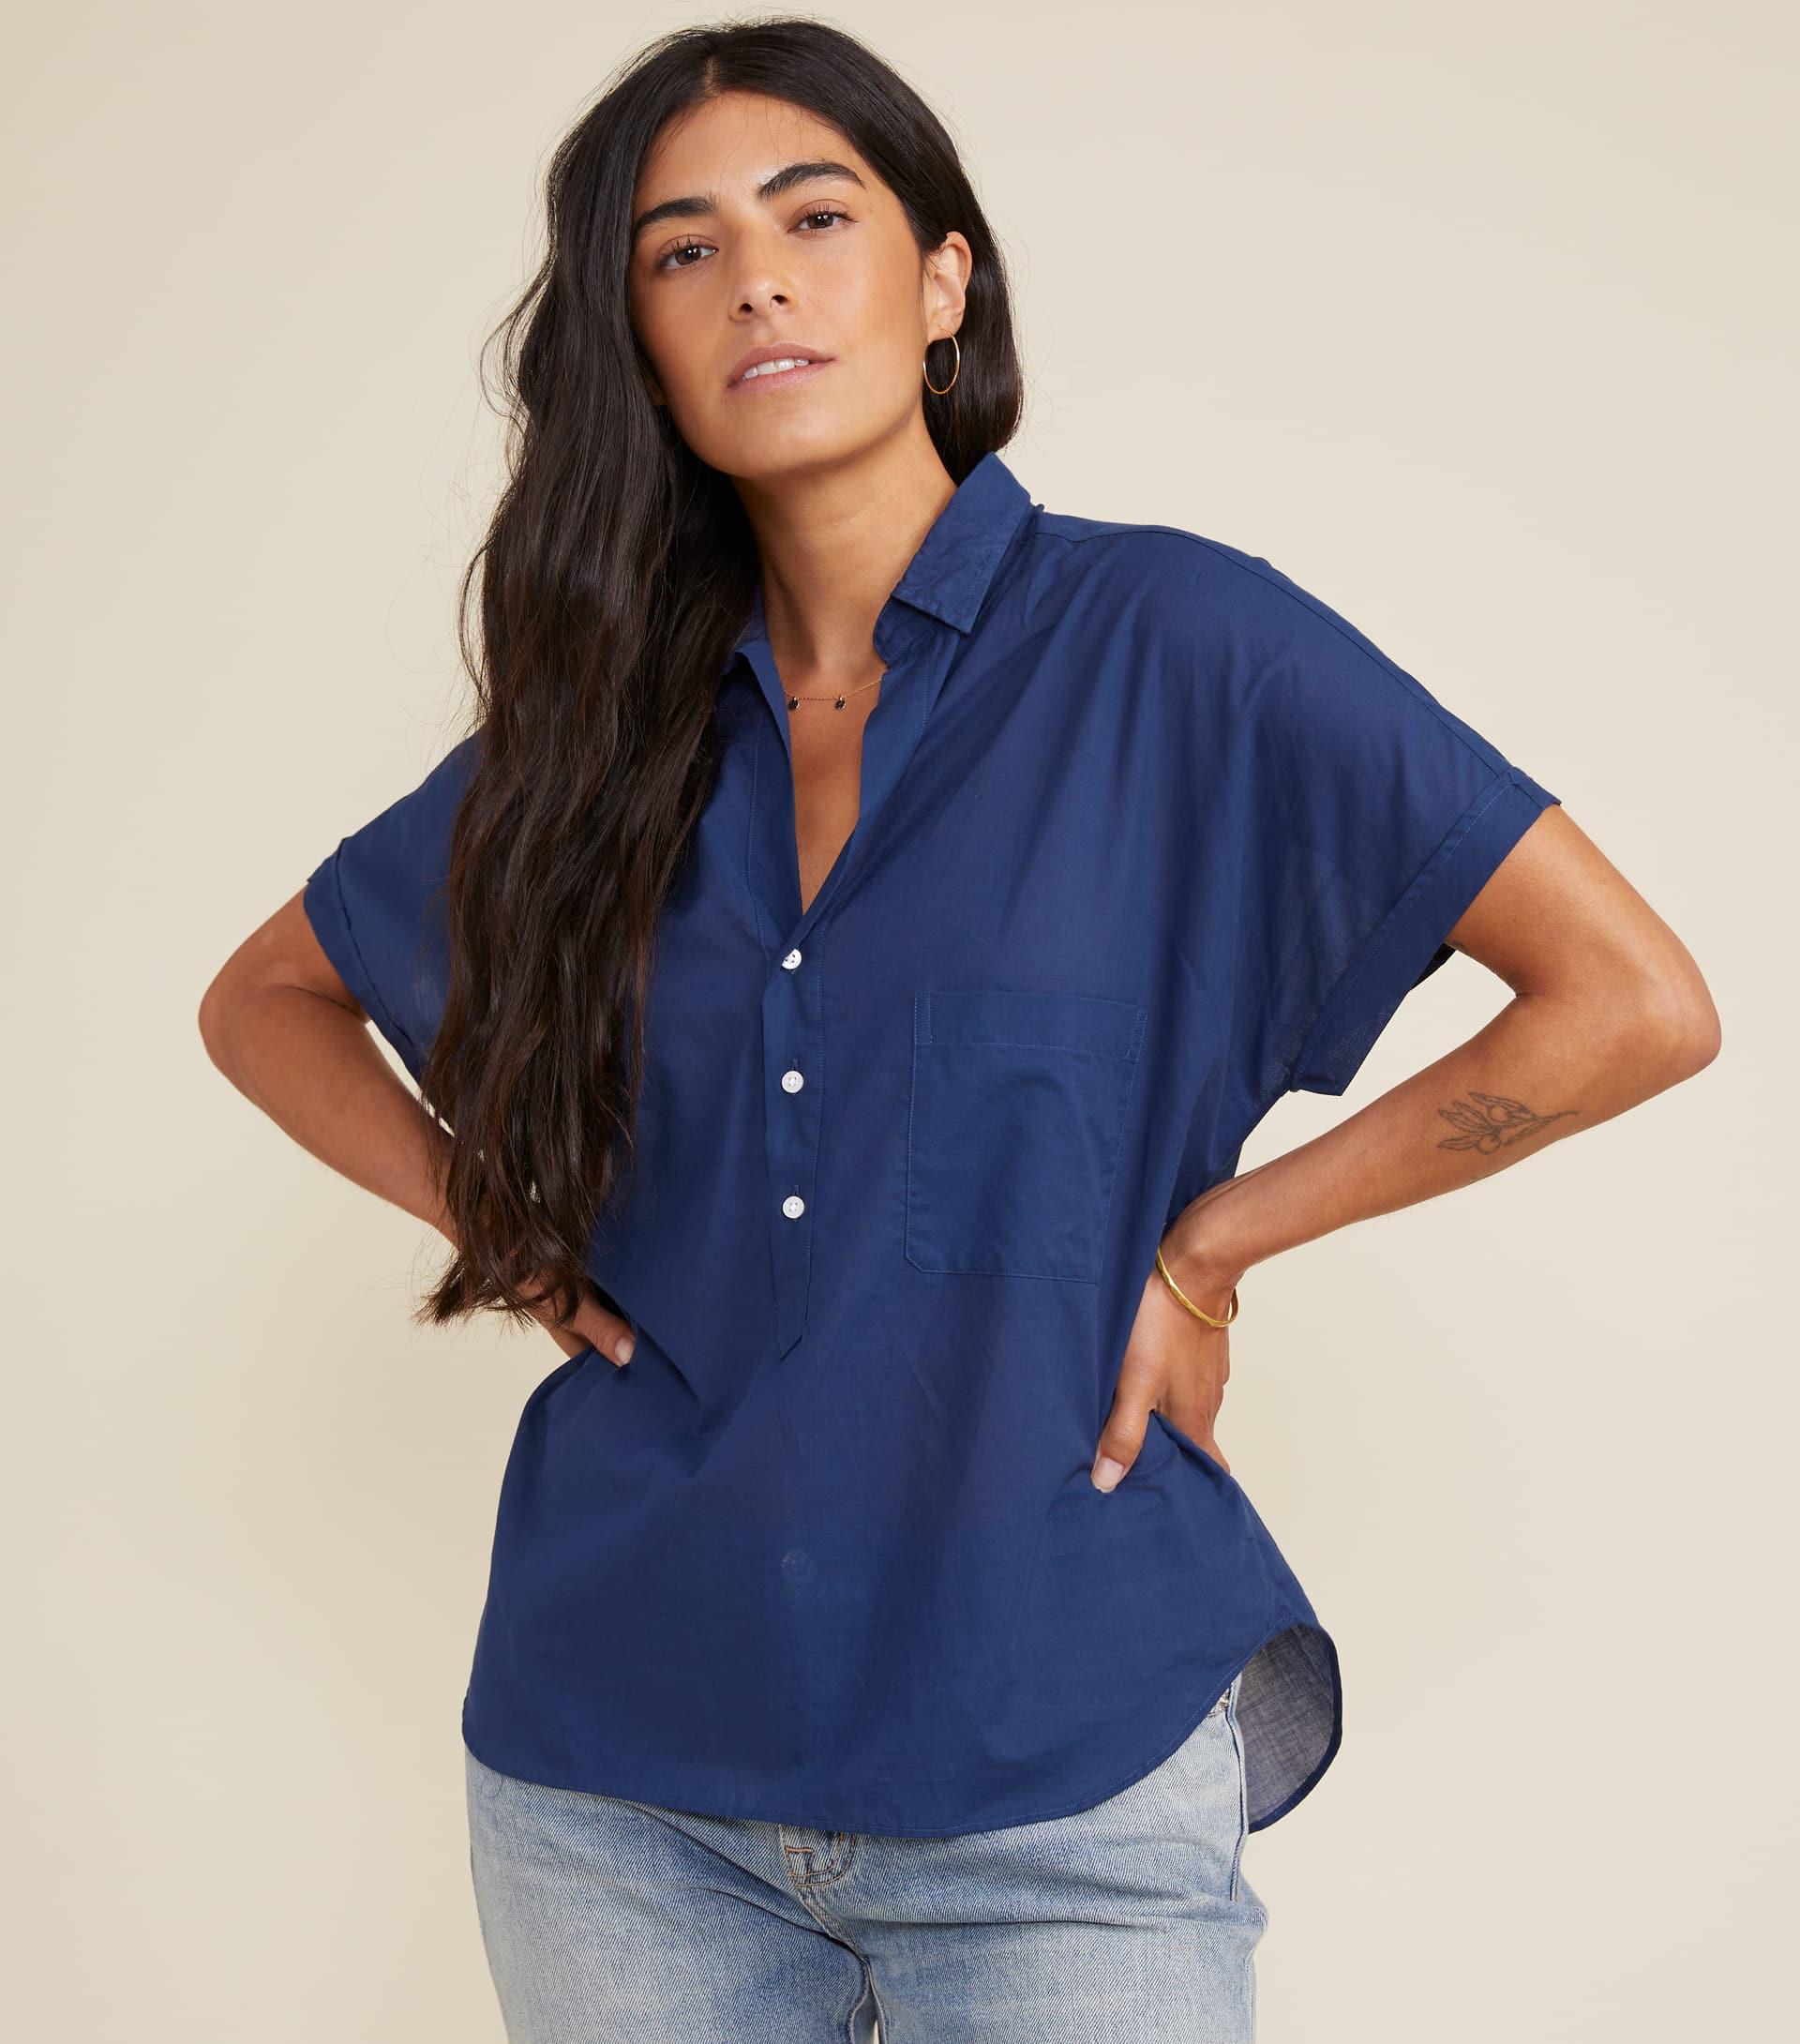 Image of The Artist Short Sleeve Shirt Navy, Tissue Cotton Final Sale